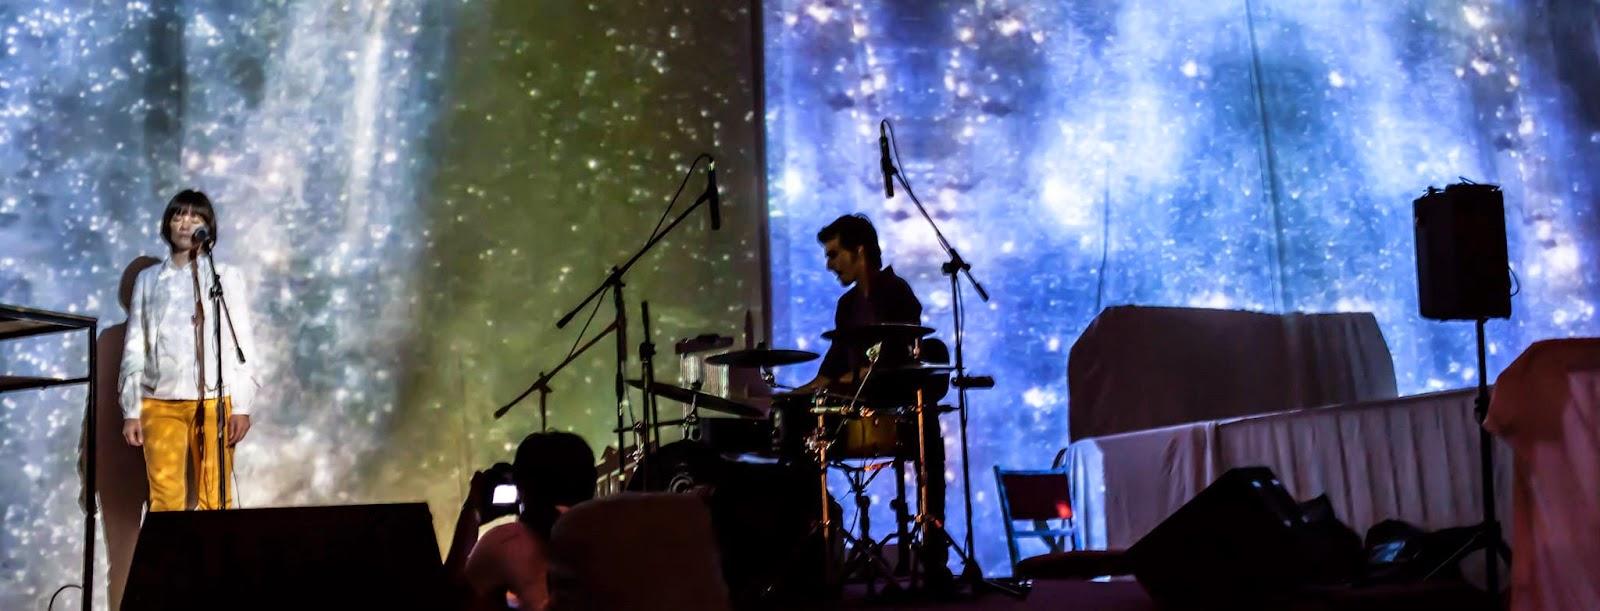 Thy Veils live at Sziget Festival 2014 - Manuela Marchis & Radu Pieloiu